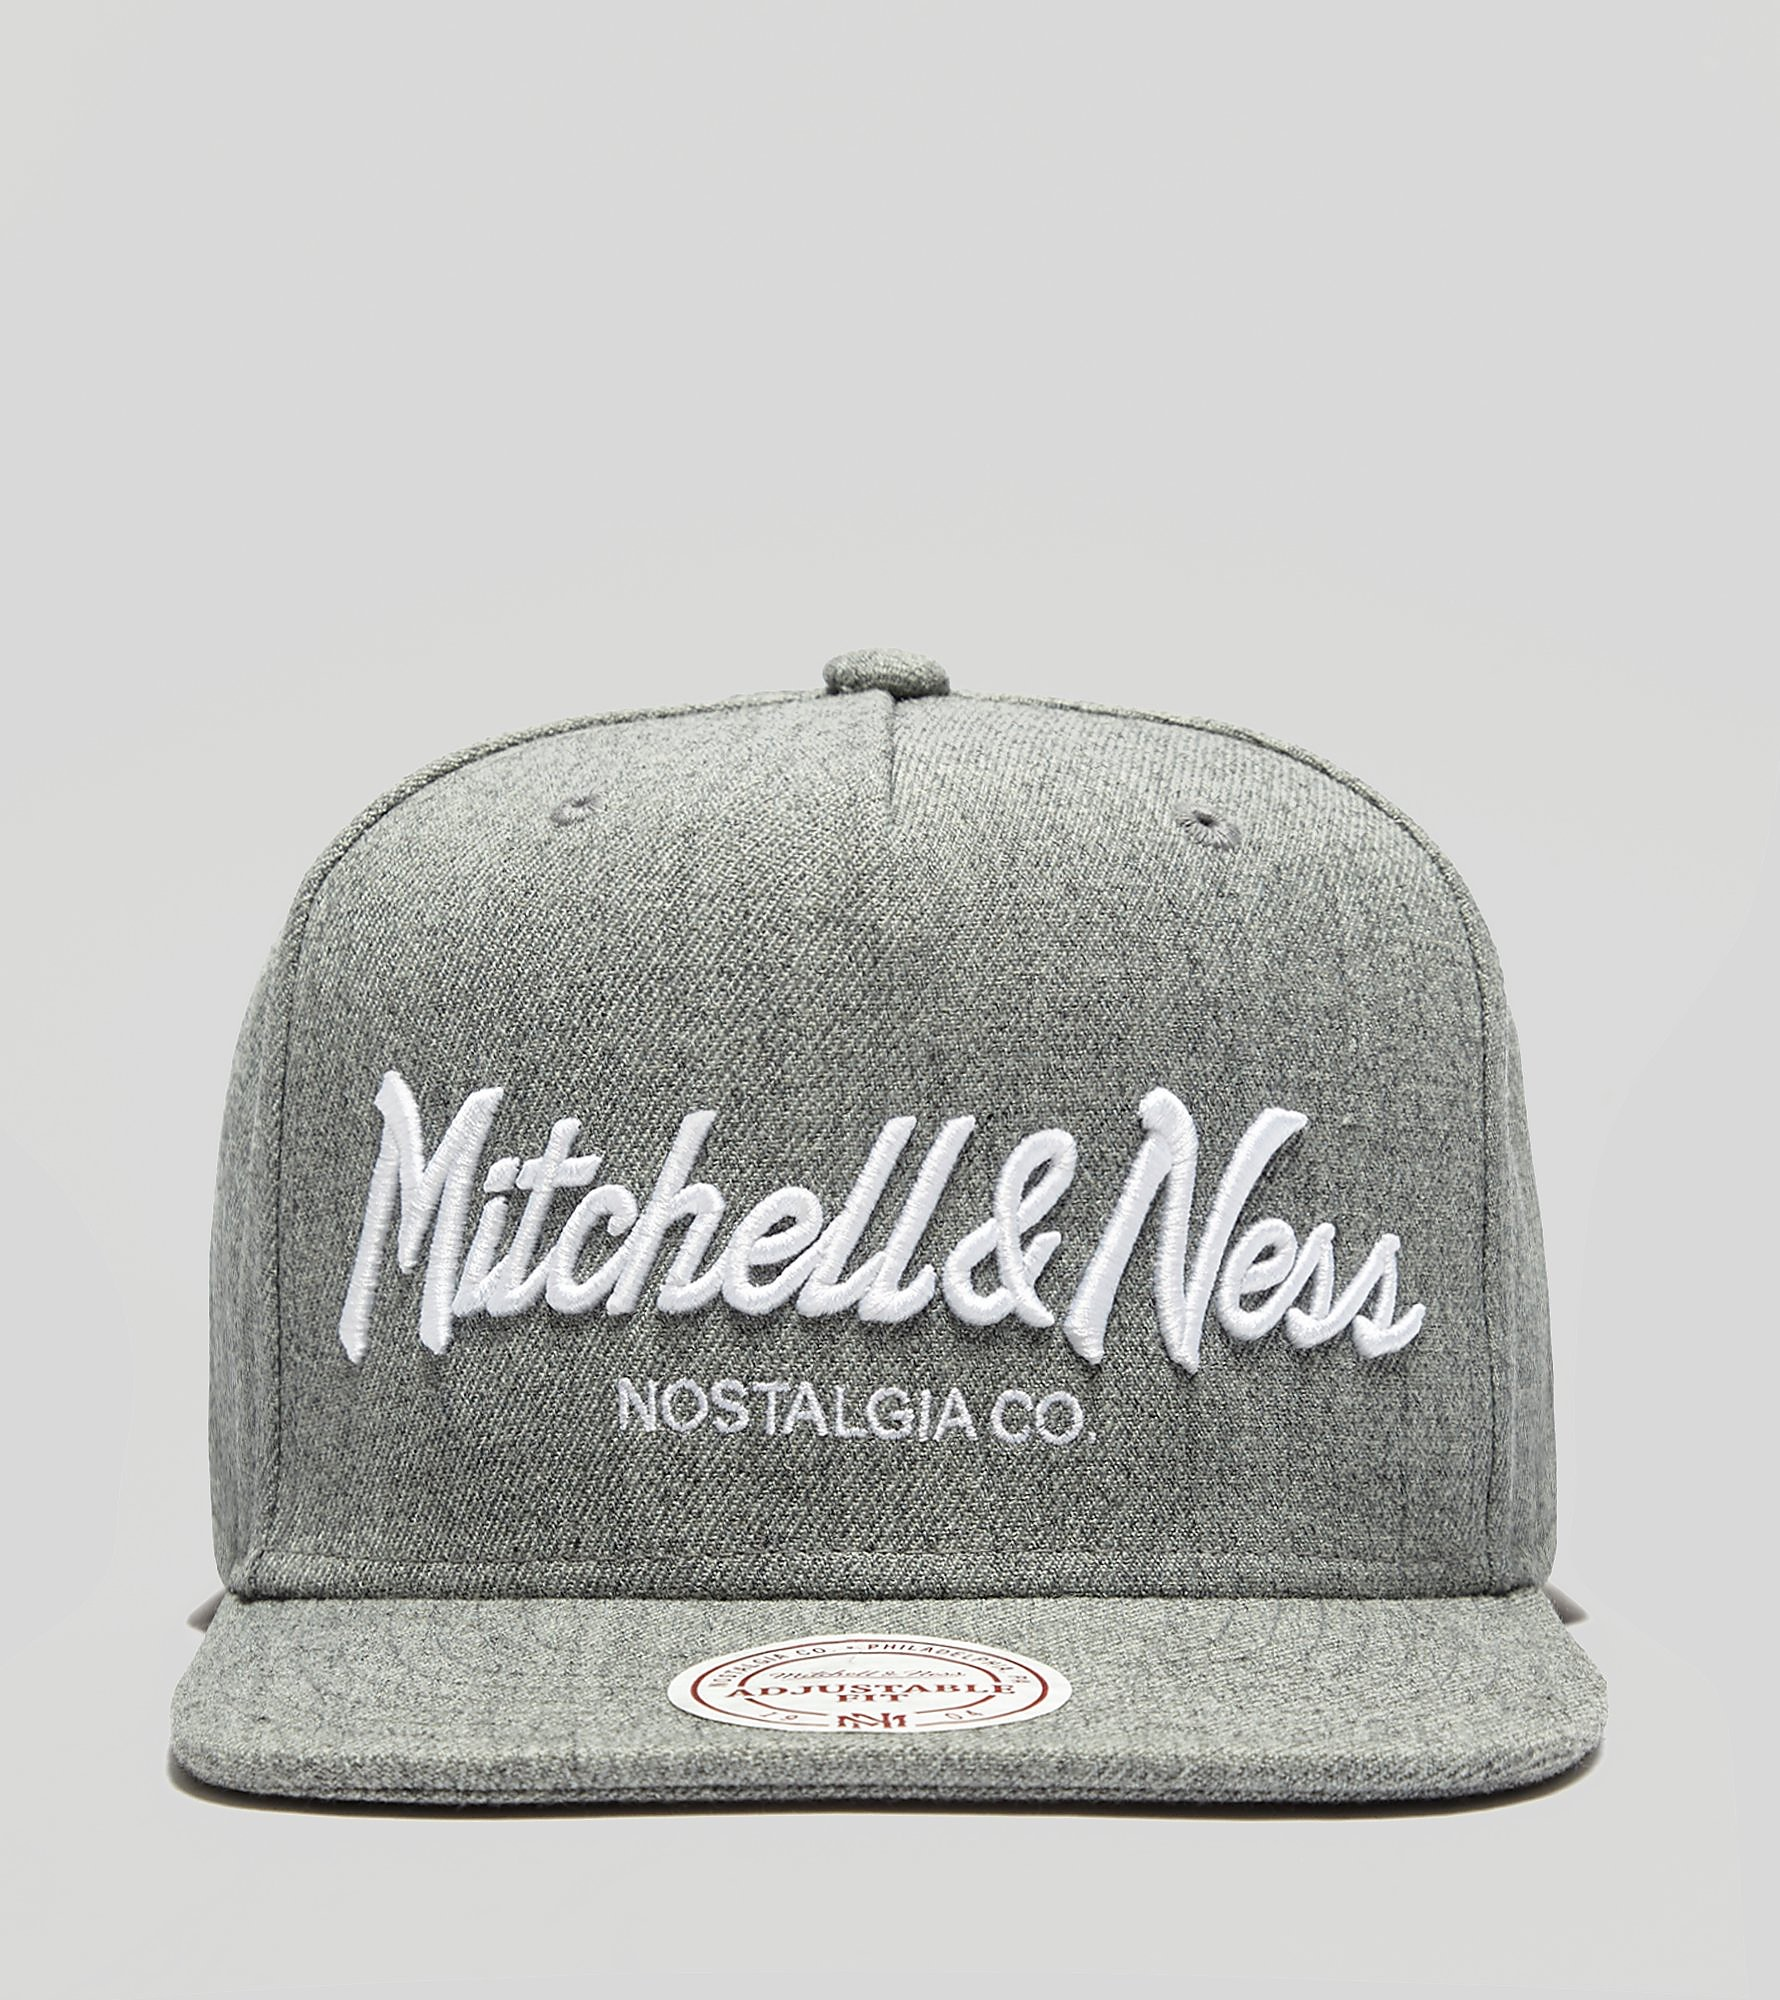 Mitchell & Ness Pinscript Snapback Cap